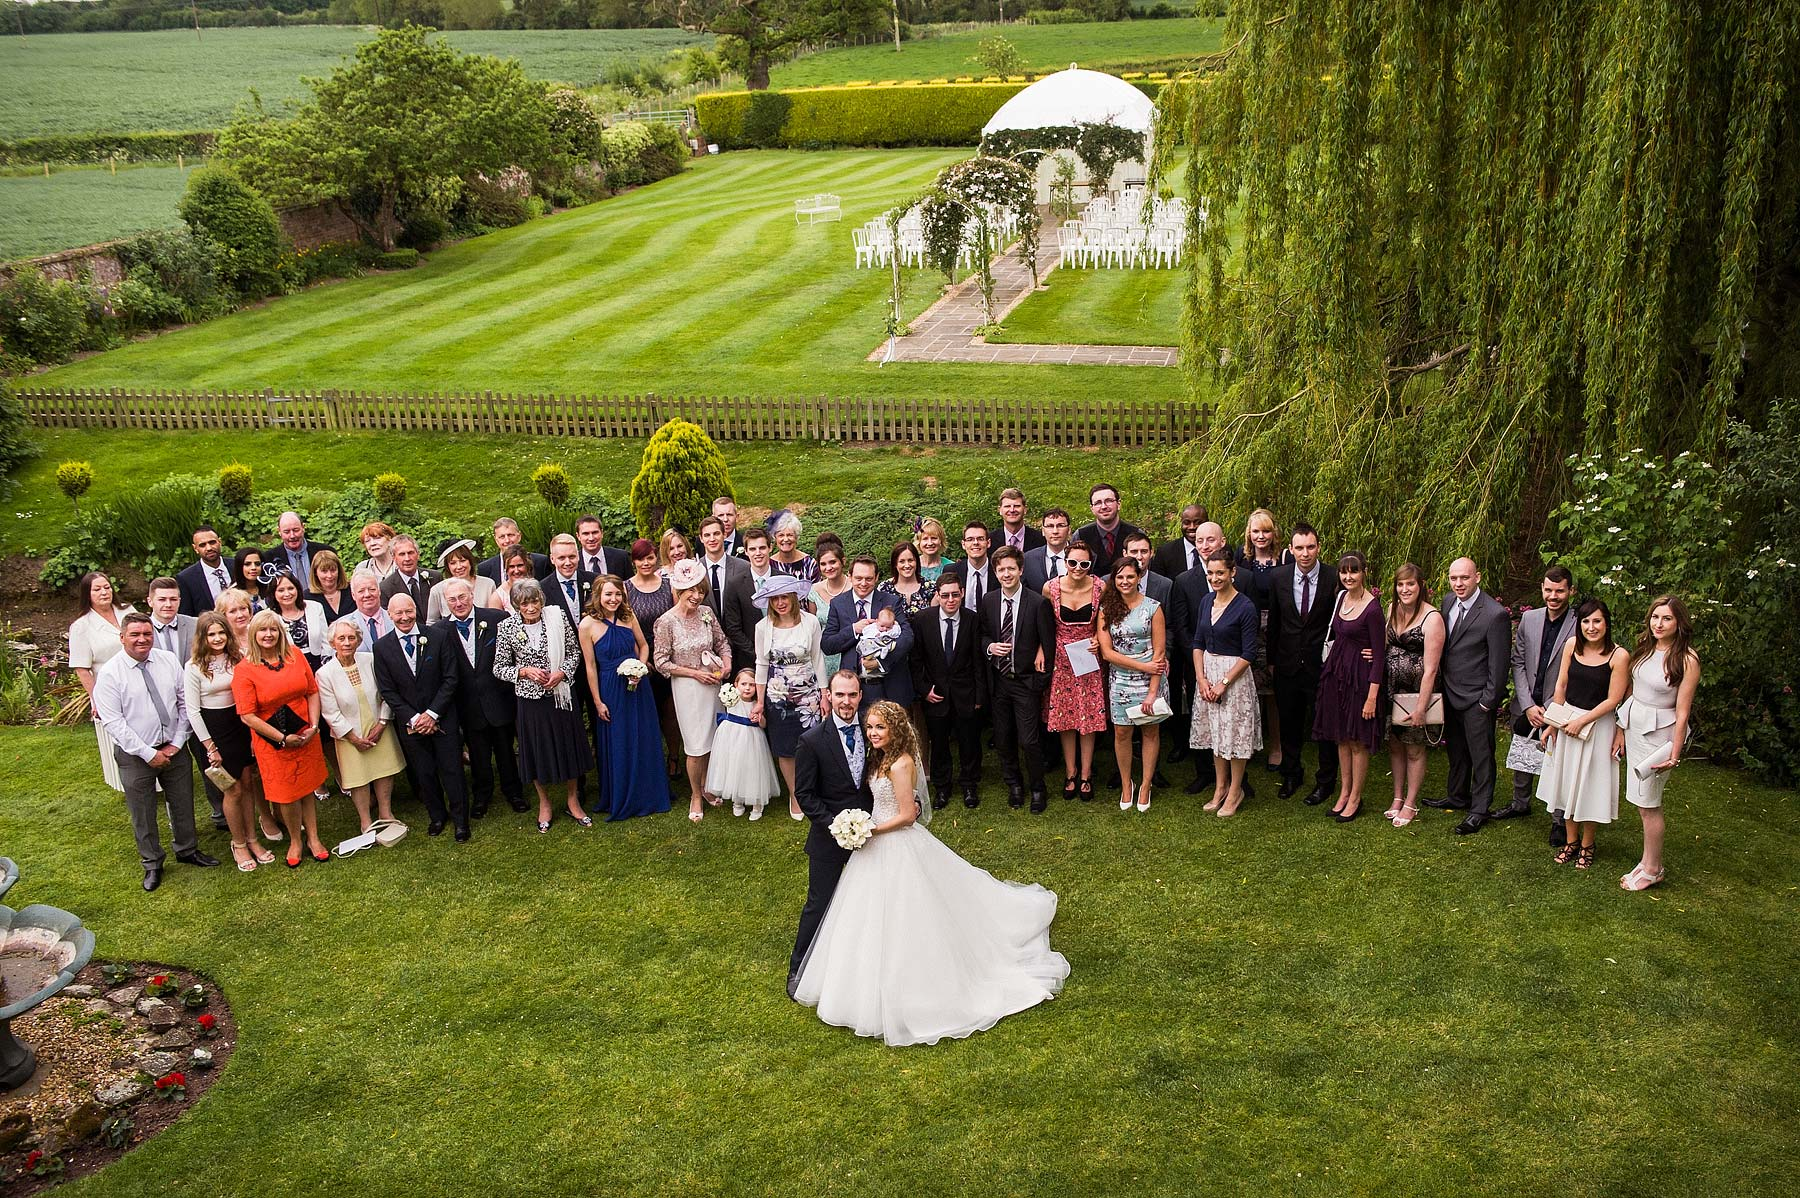 albright-hussey-manor-wedding-photographers-039